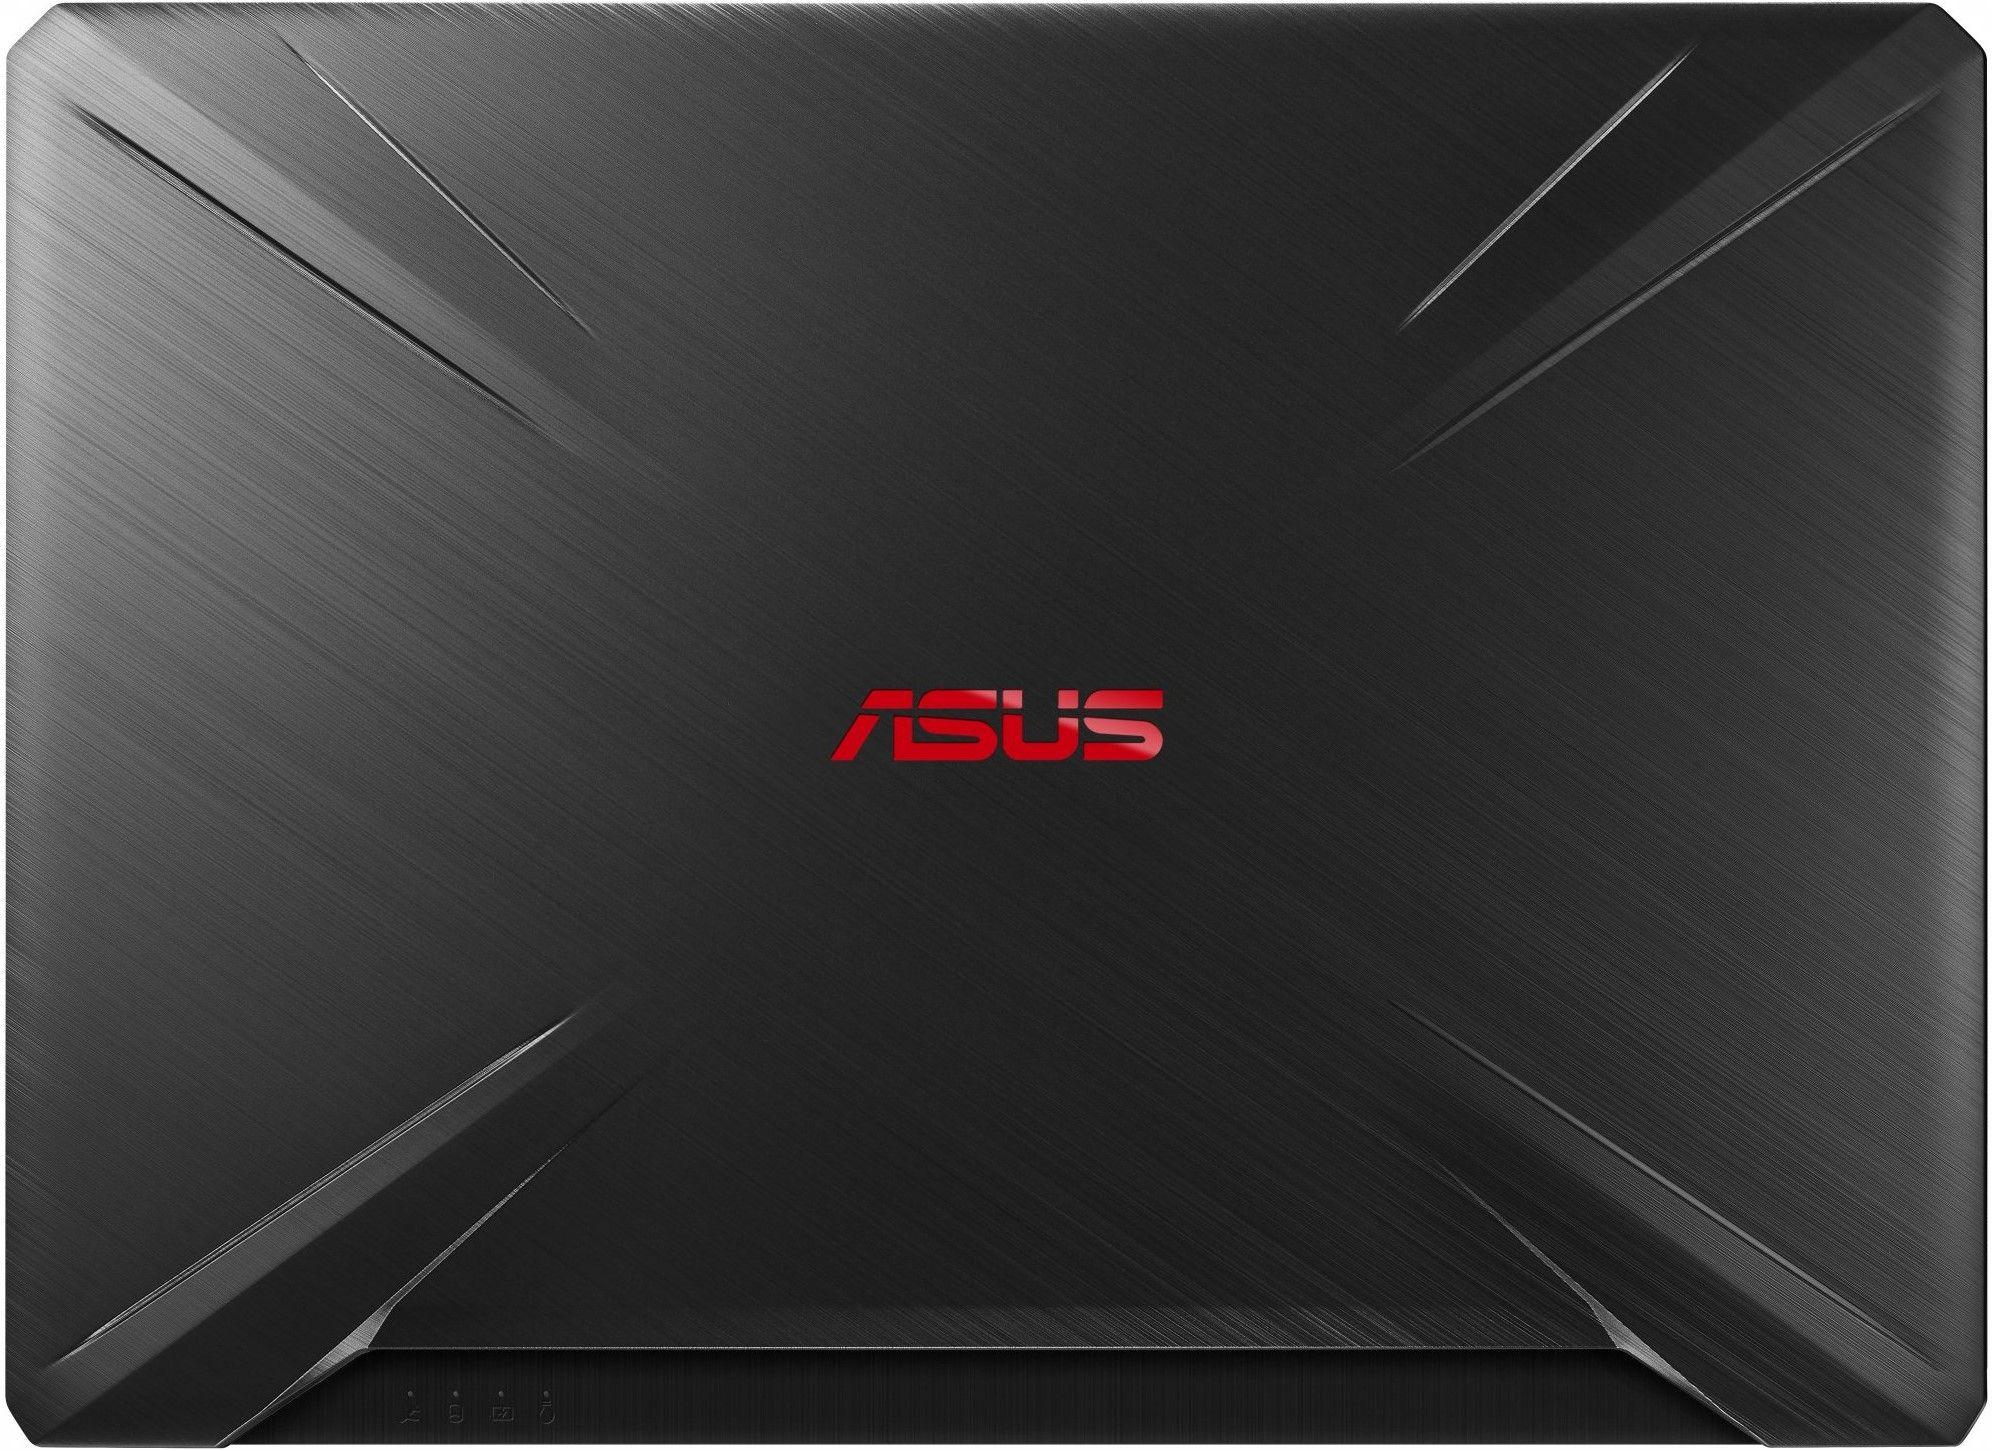 Гейминг лаптоп Asus - FX705GD-EW090, черен - 4